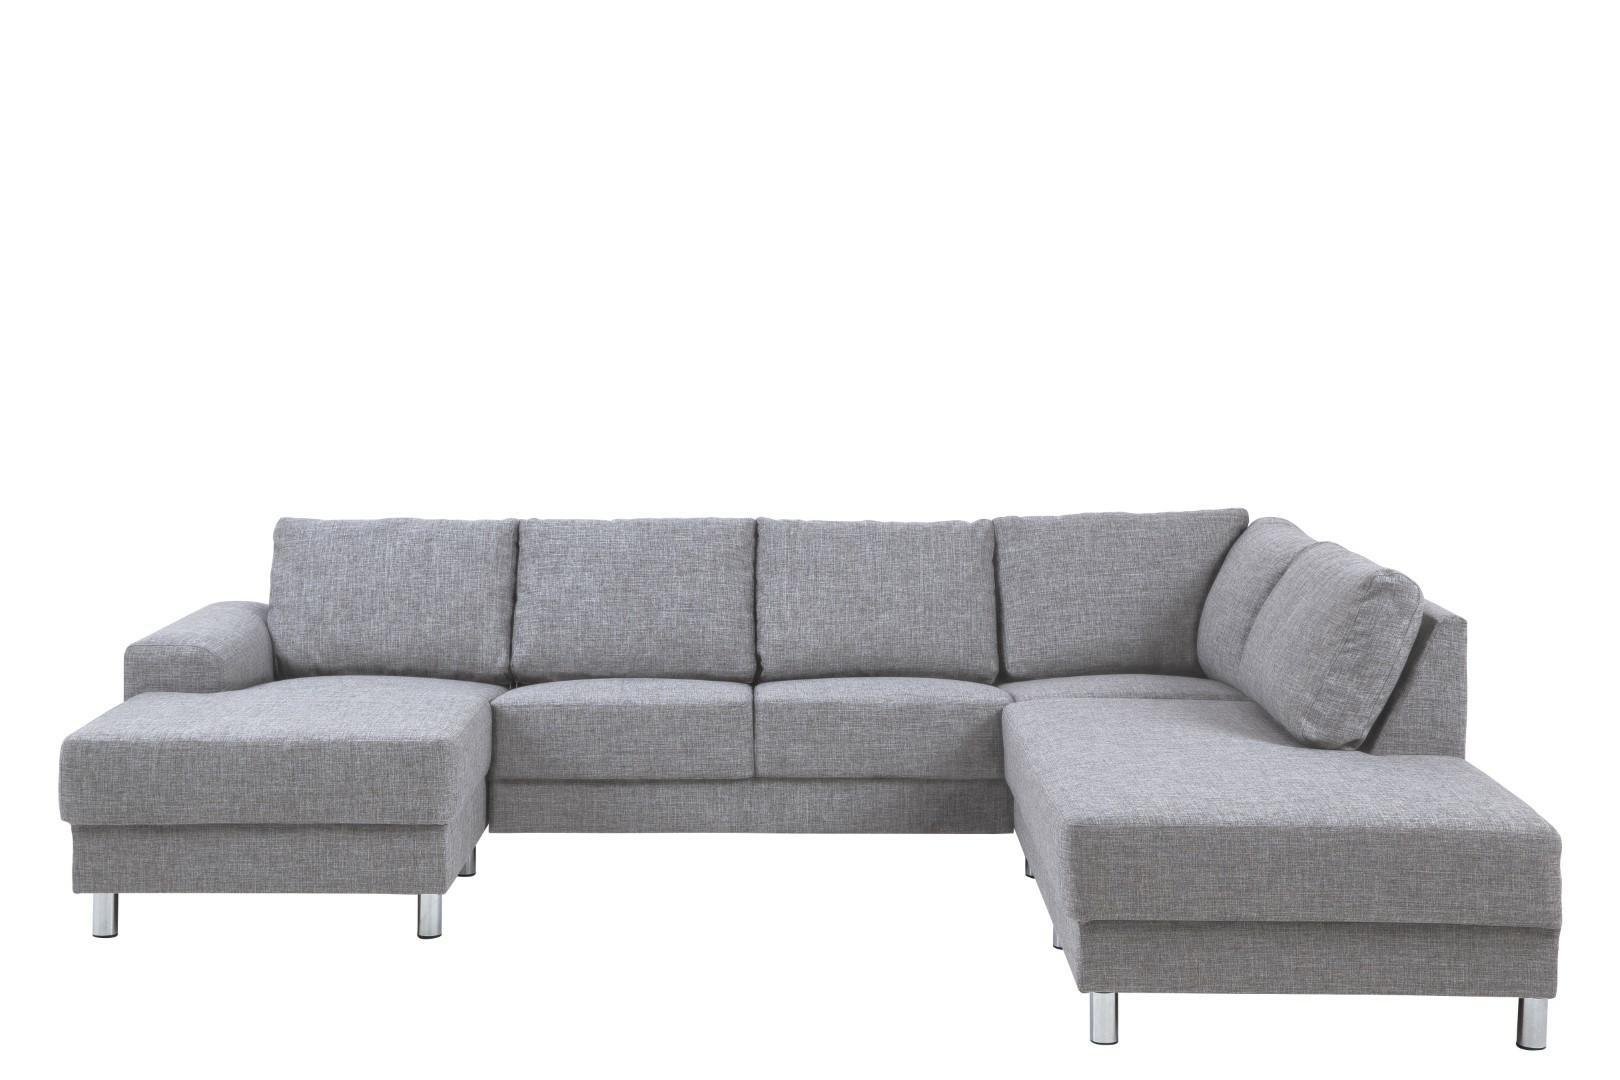 Narożna sofa Calverton Szara prawa - zdjęcie nr 0